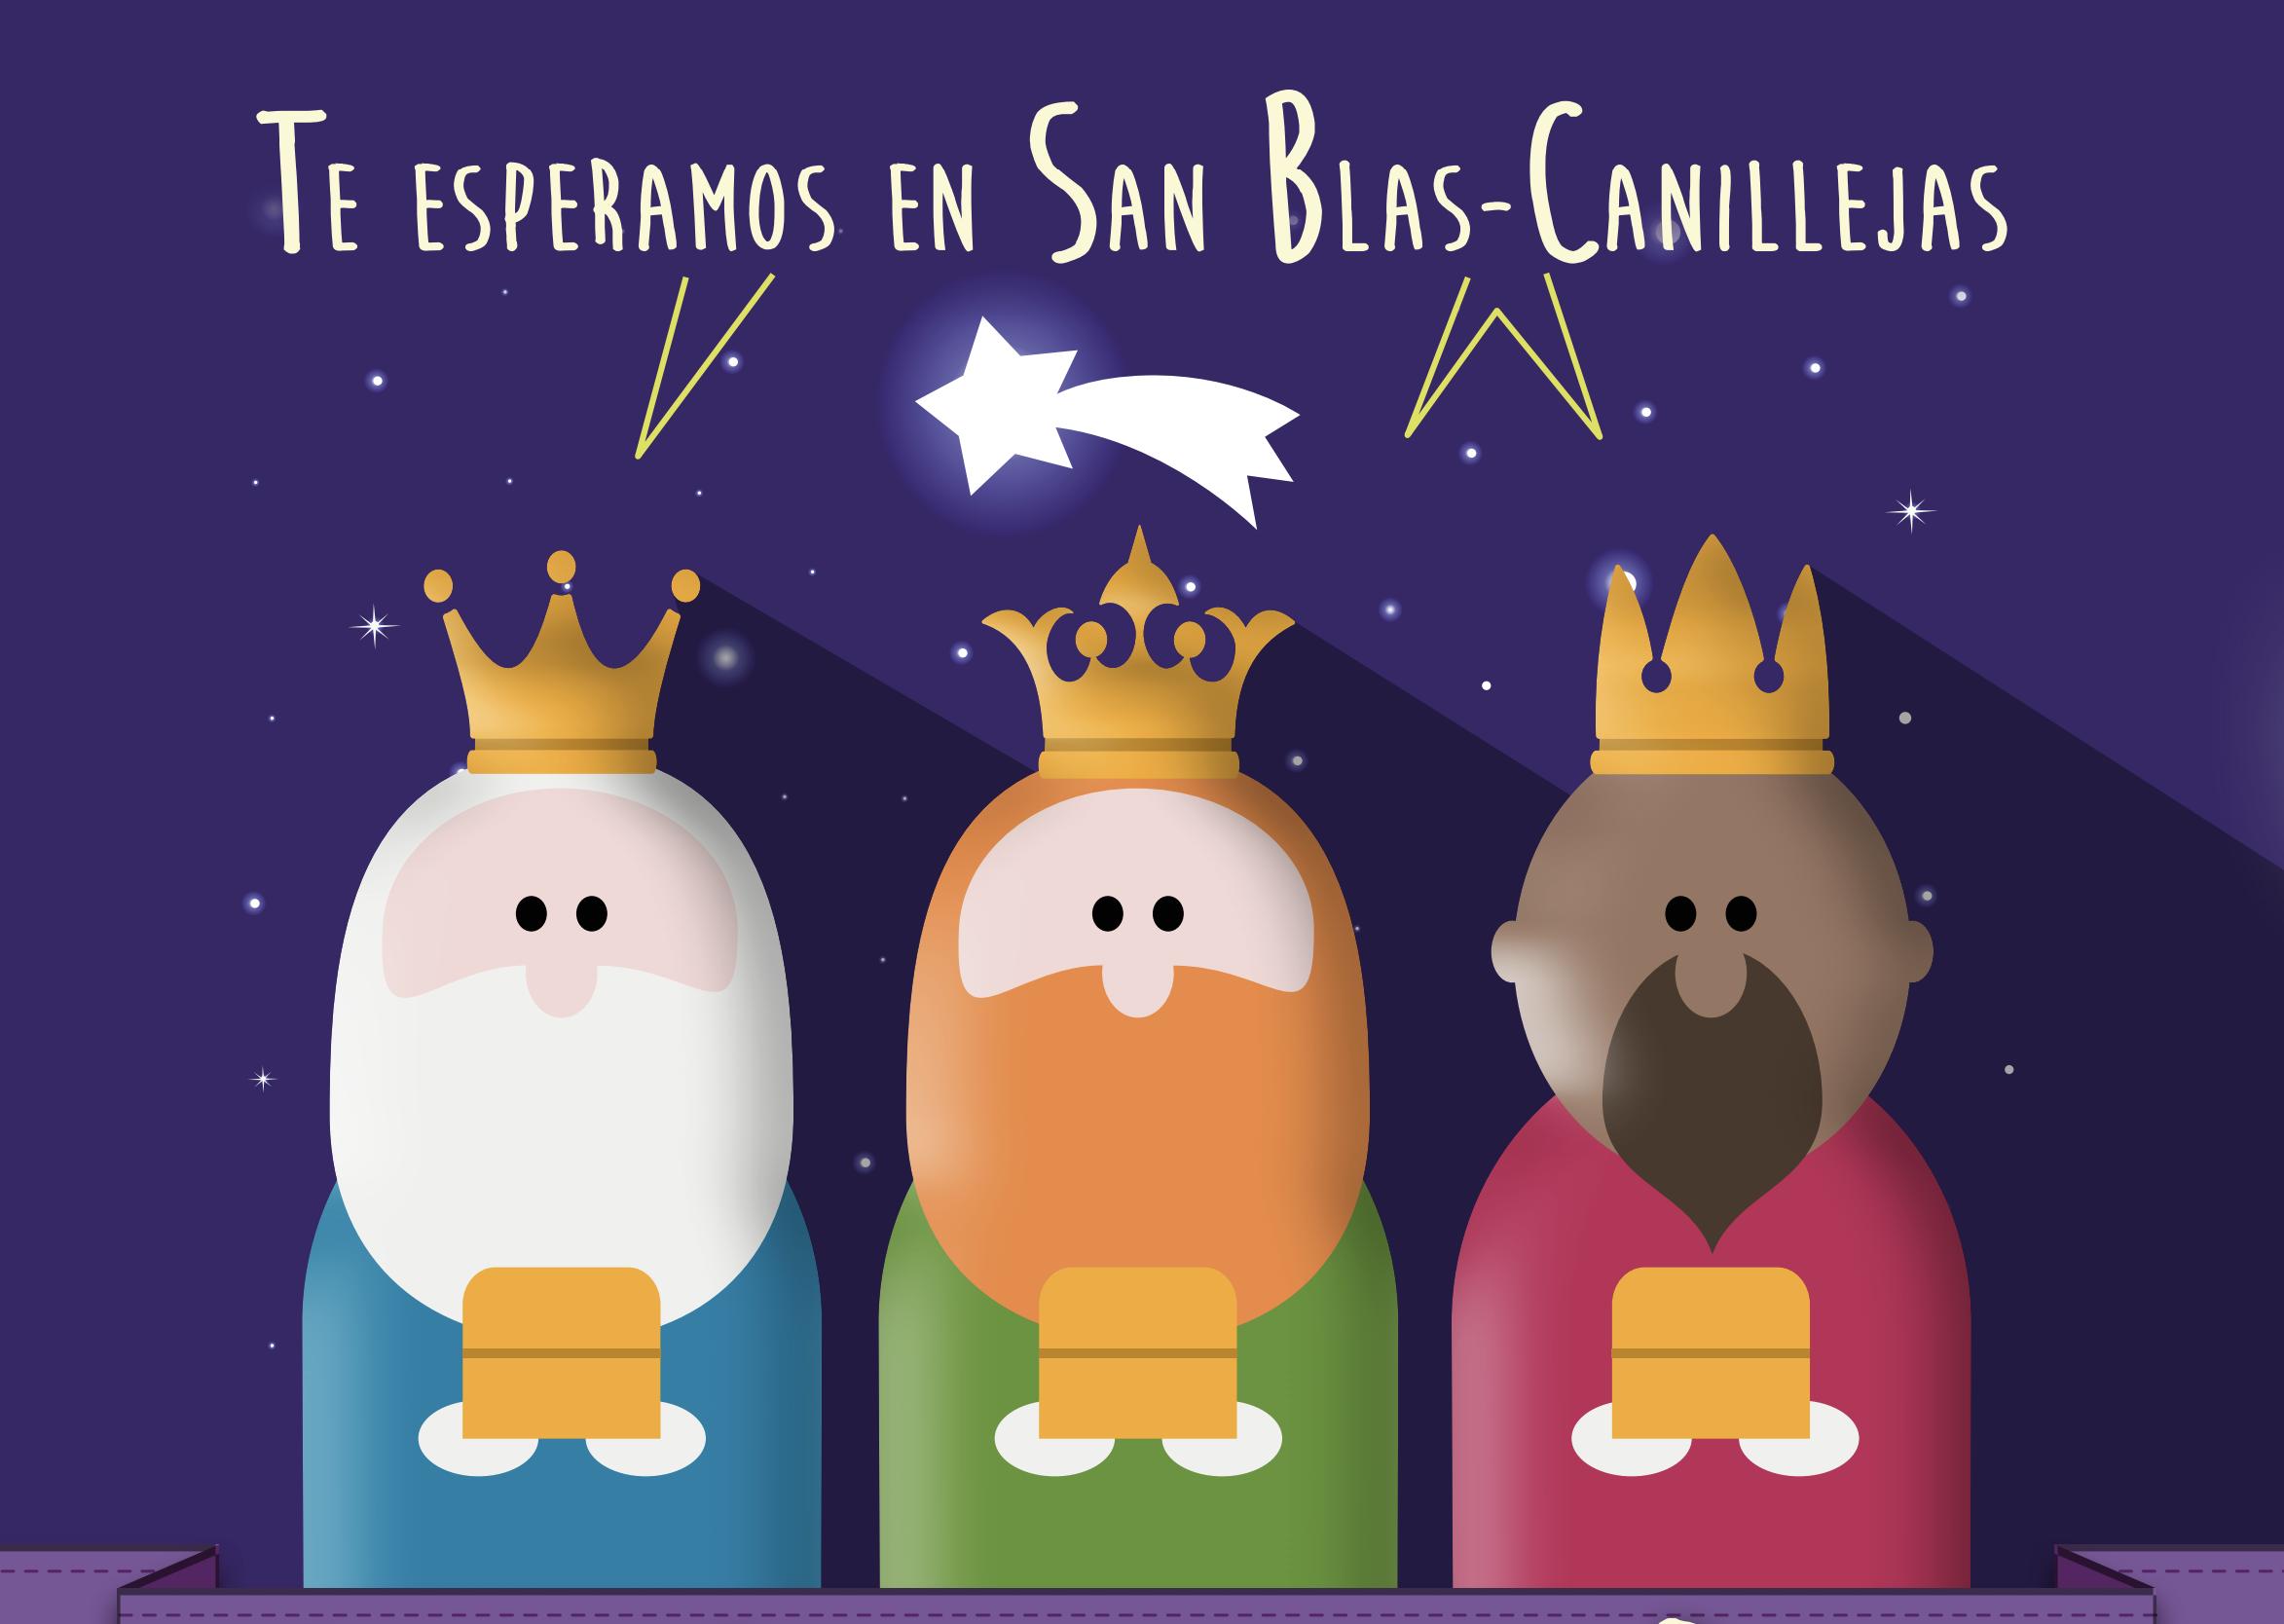 Cabalgata de reyes san blas canillejas